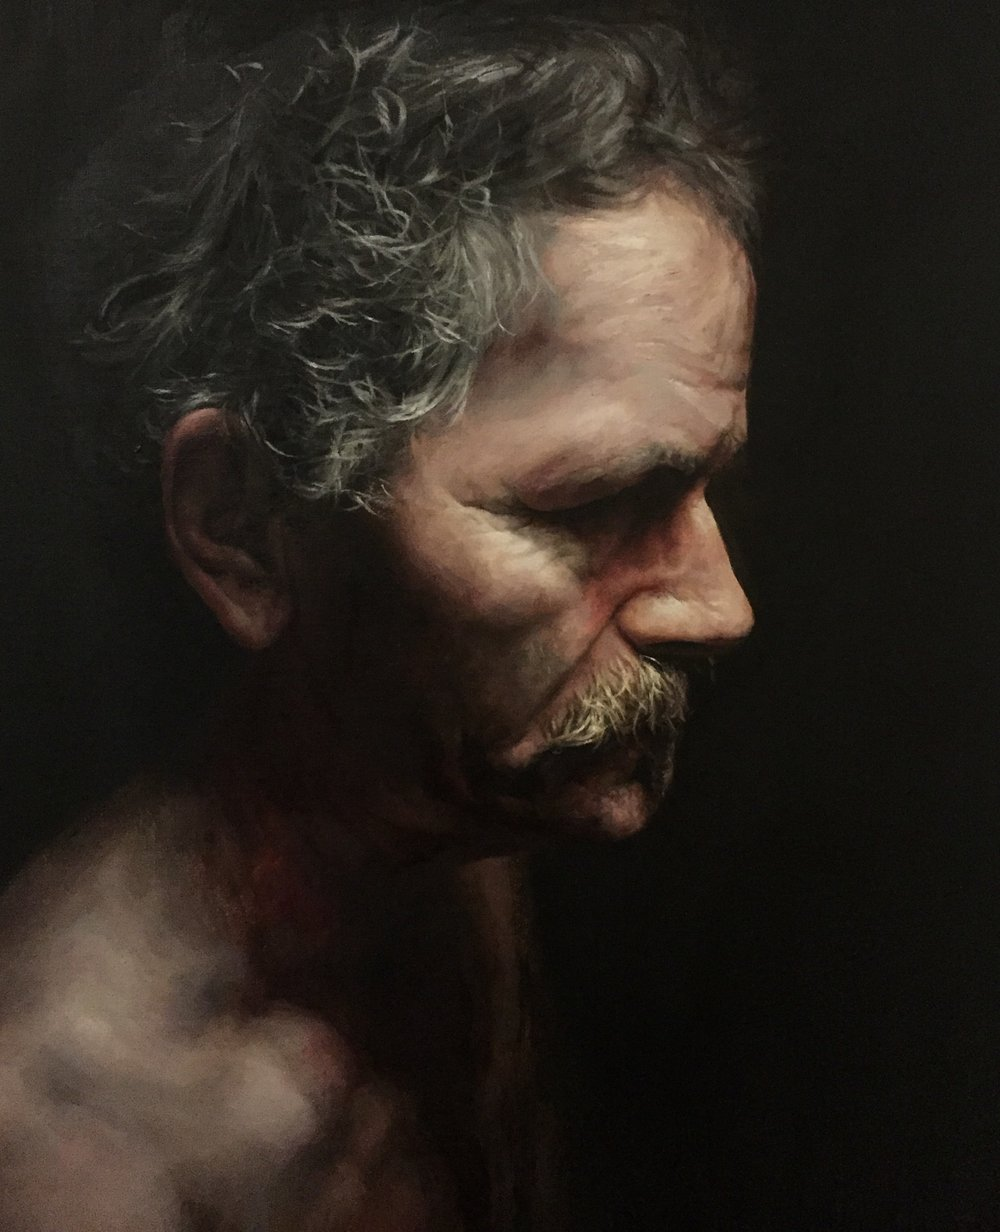 Daniel Fitzpatrick - Honorable Mention